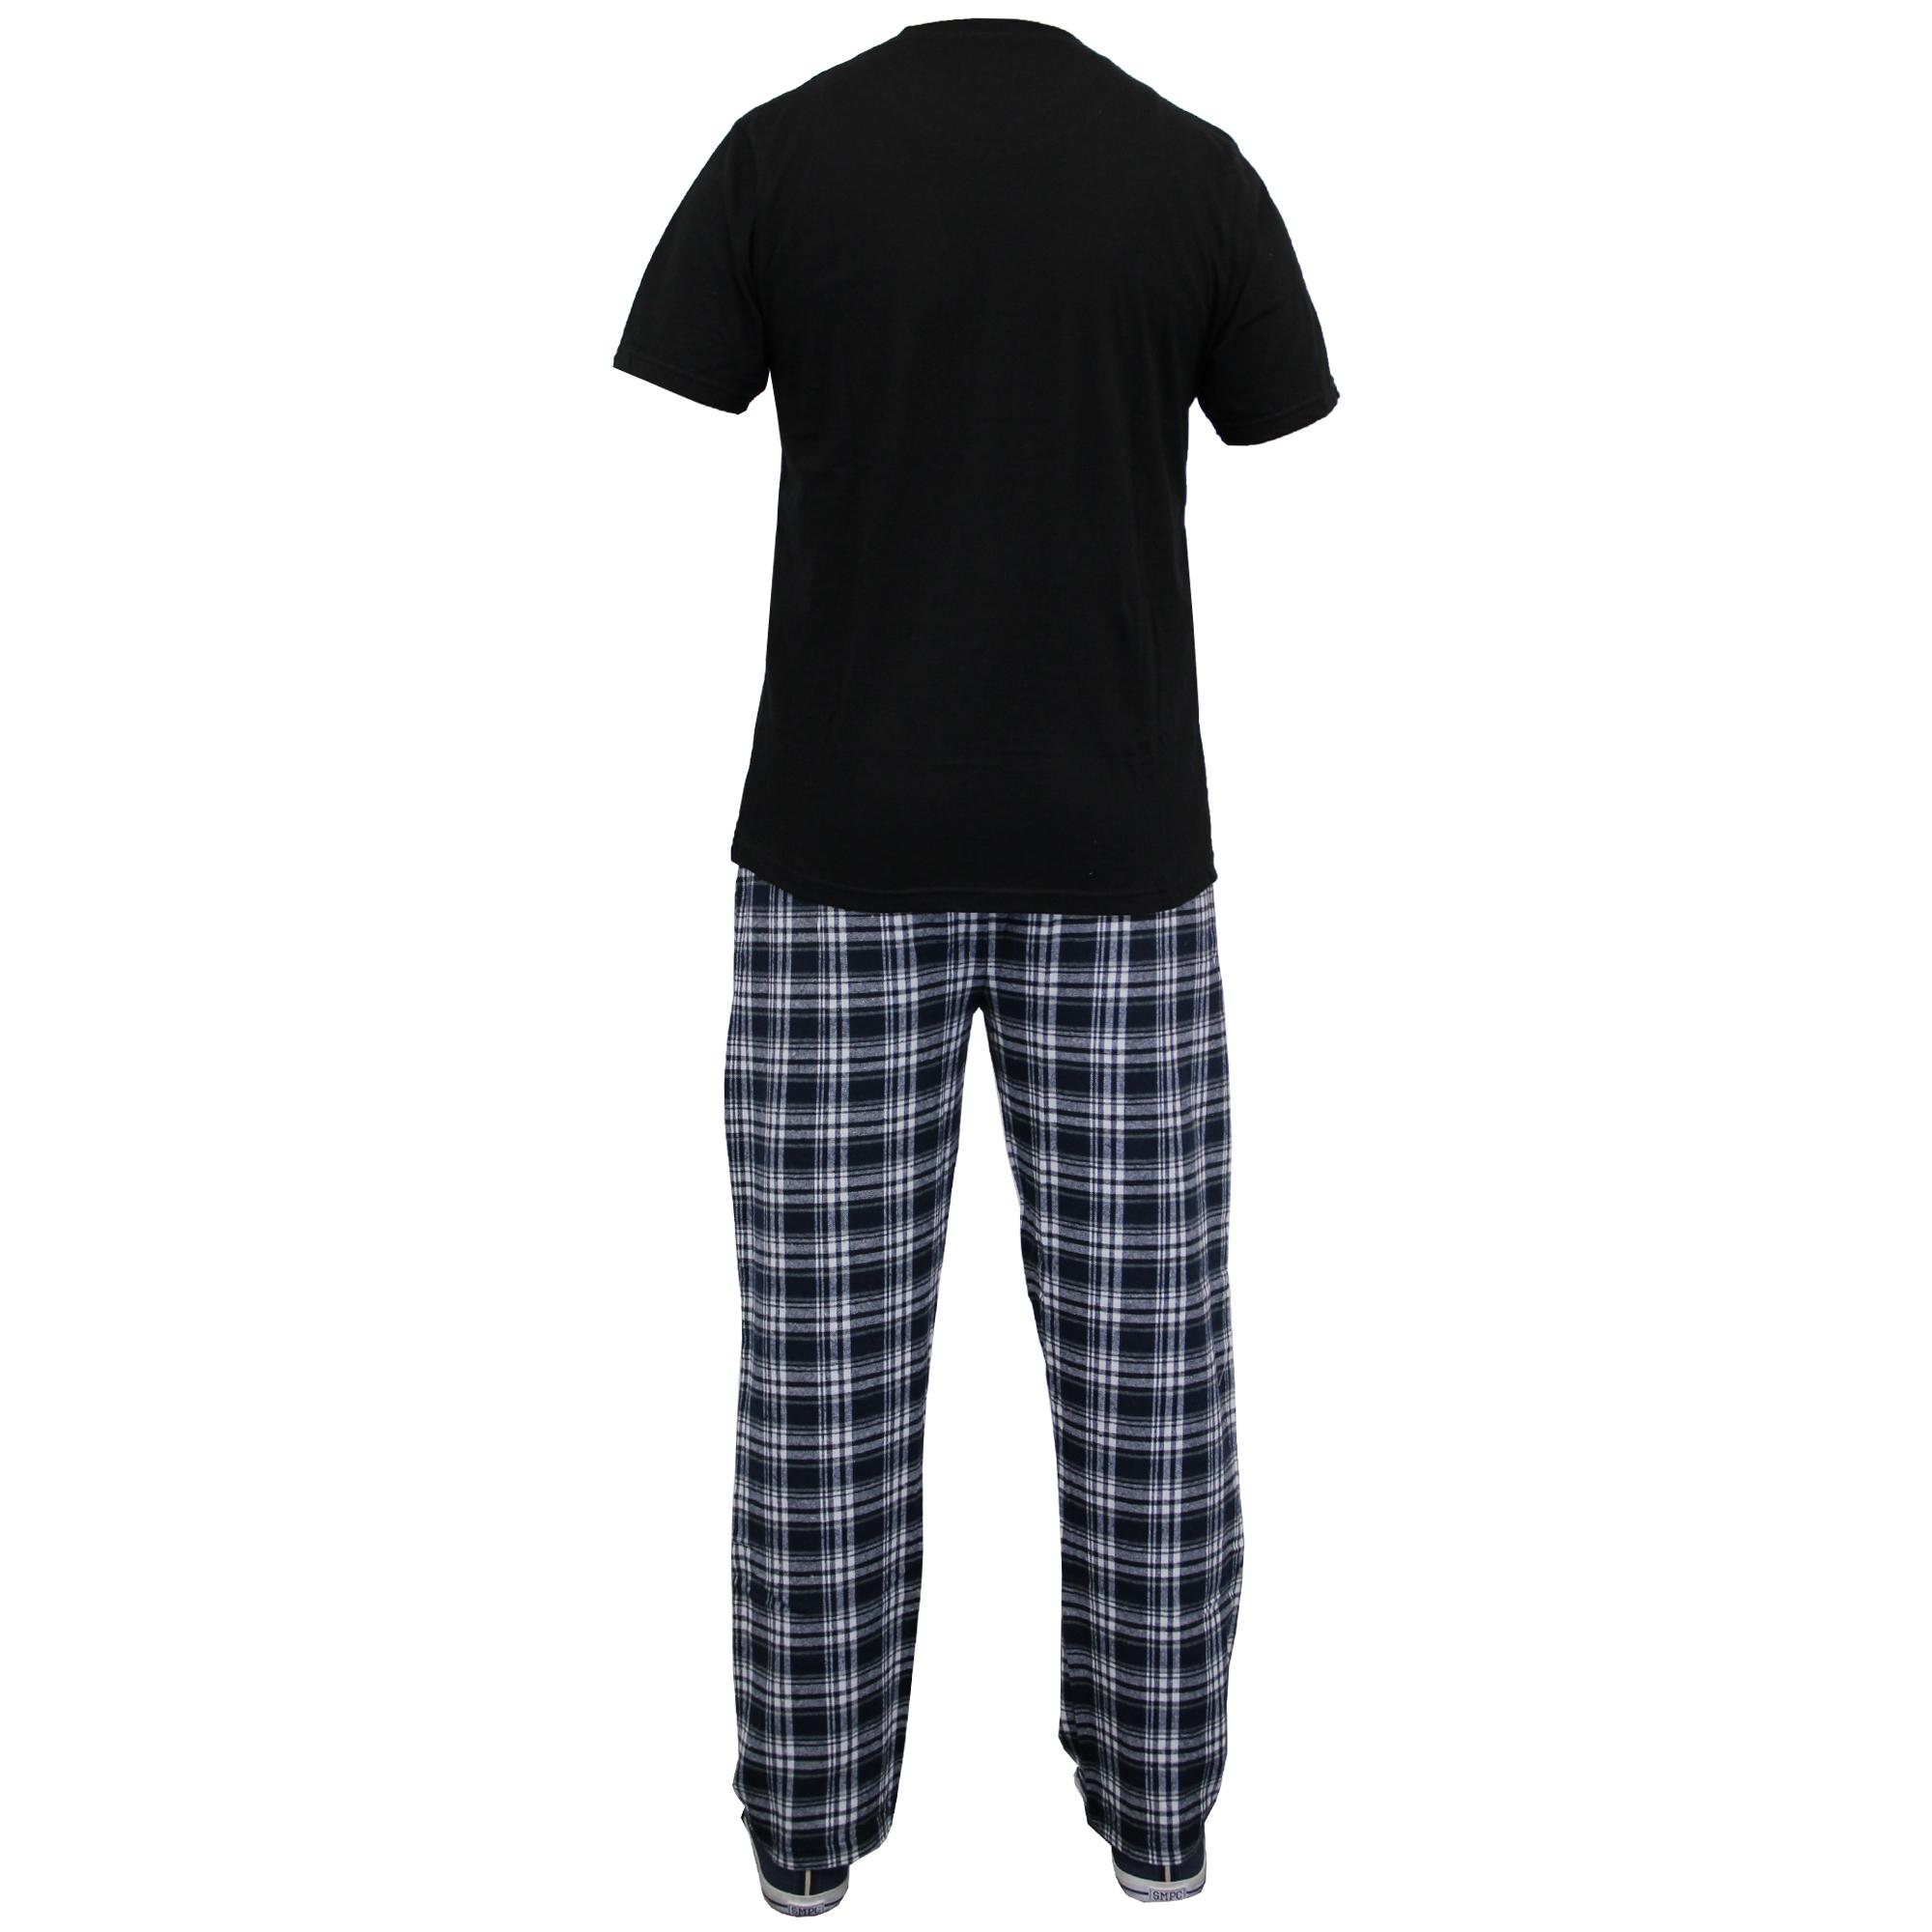 Brave Soul Mens Loungewear Top /& Bottom Check Pyjama Nightwear Set